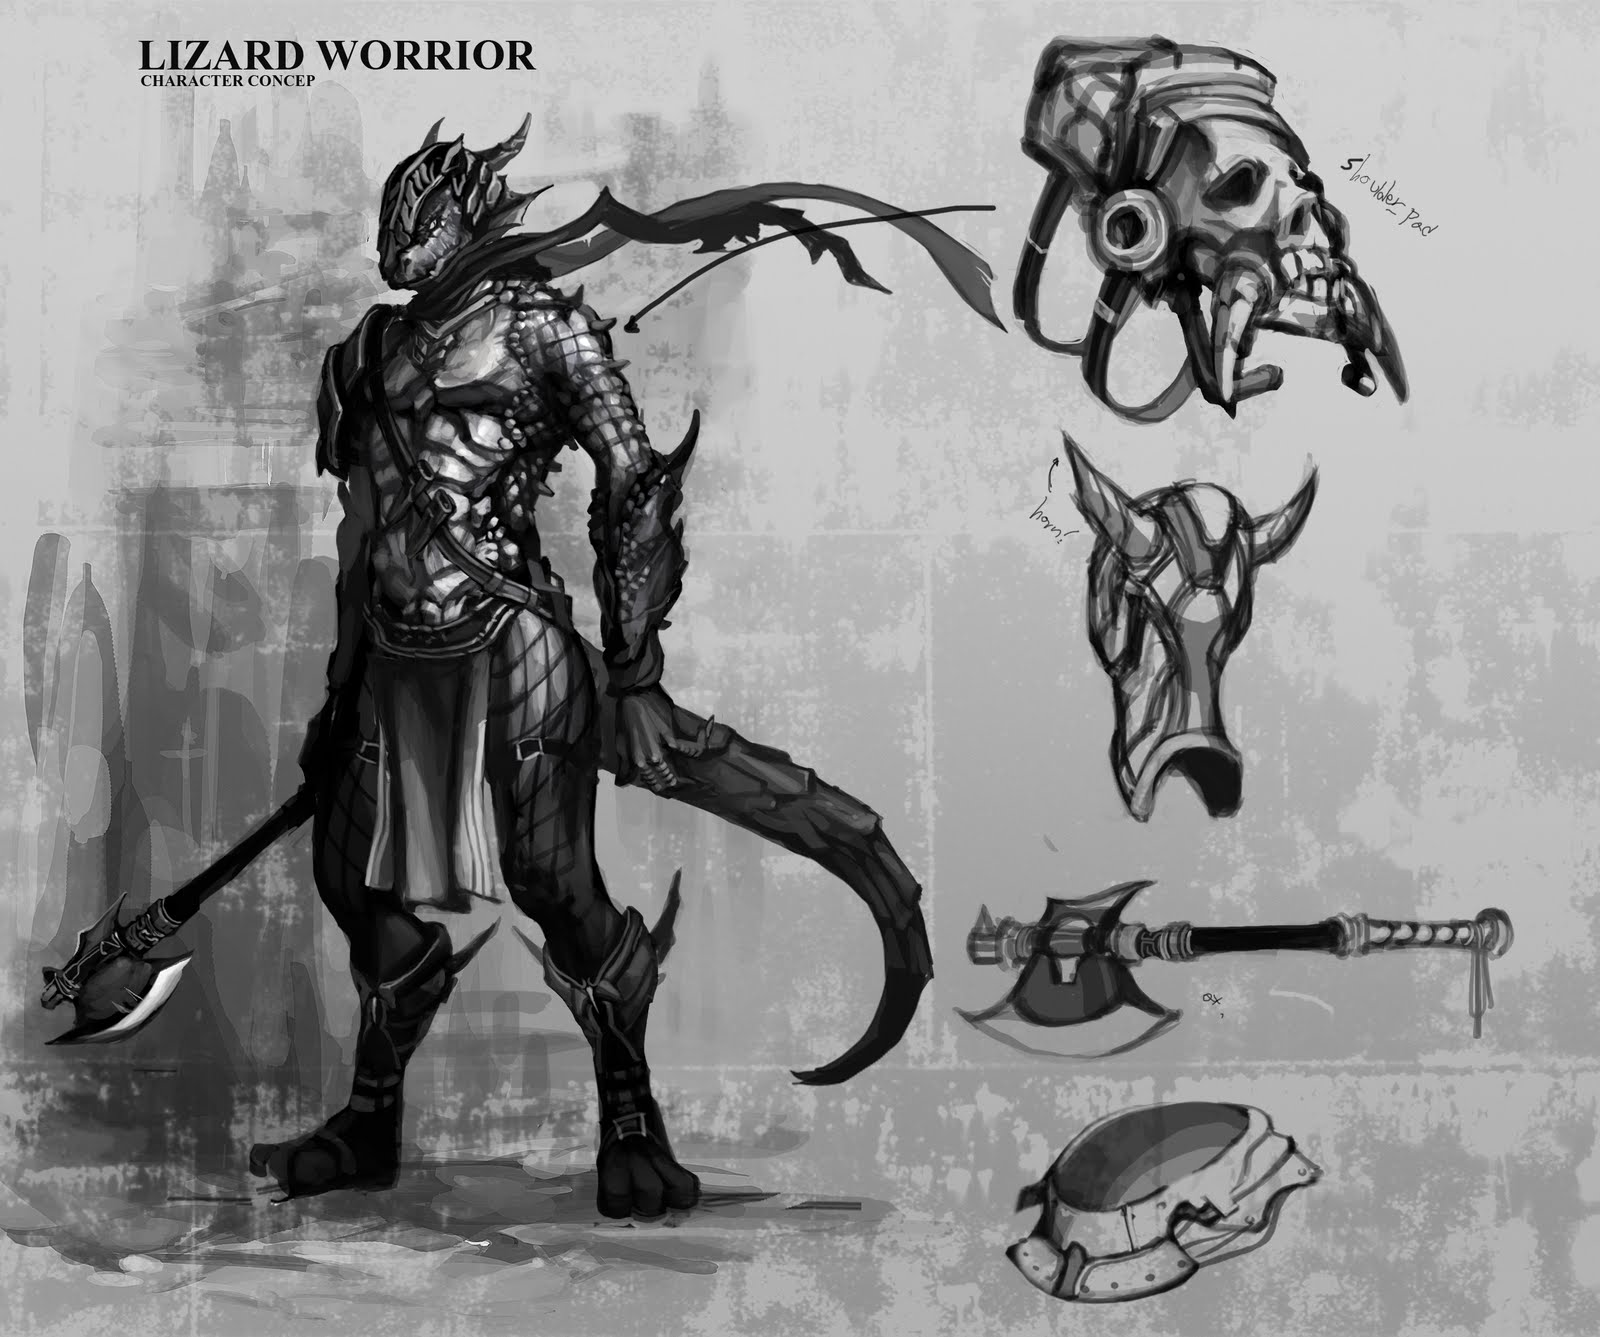 Drawn warrior reptile Warrior Pinterest lizard lizard Male